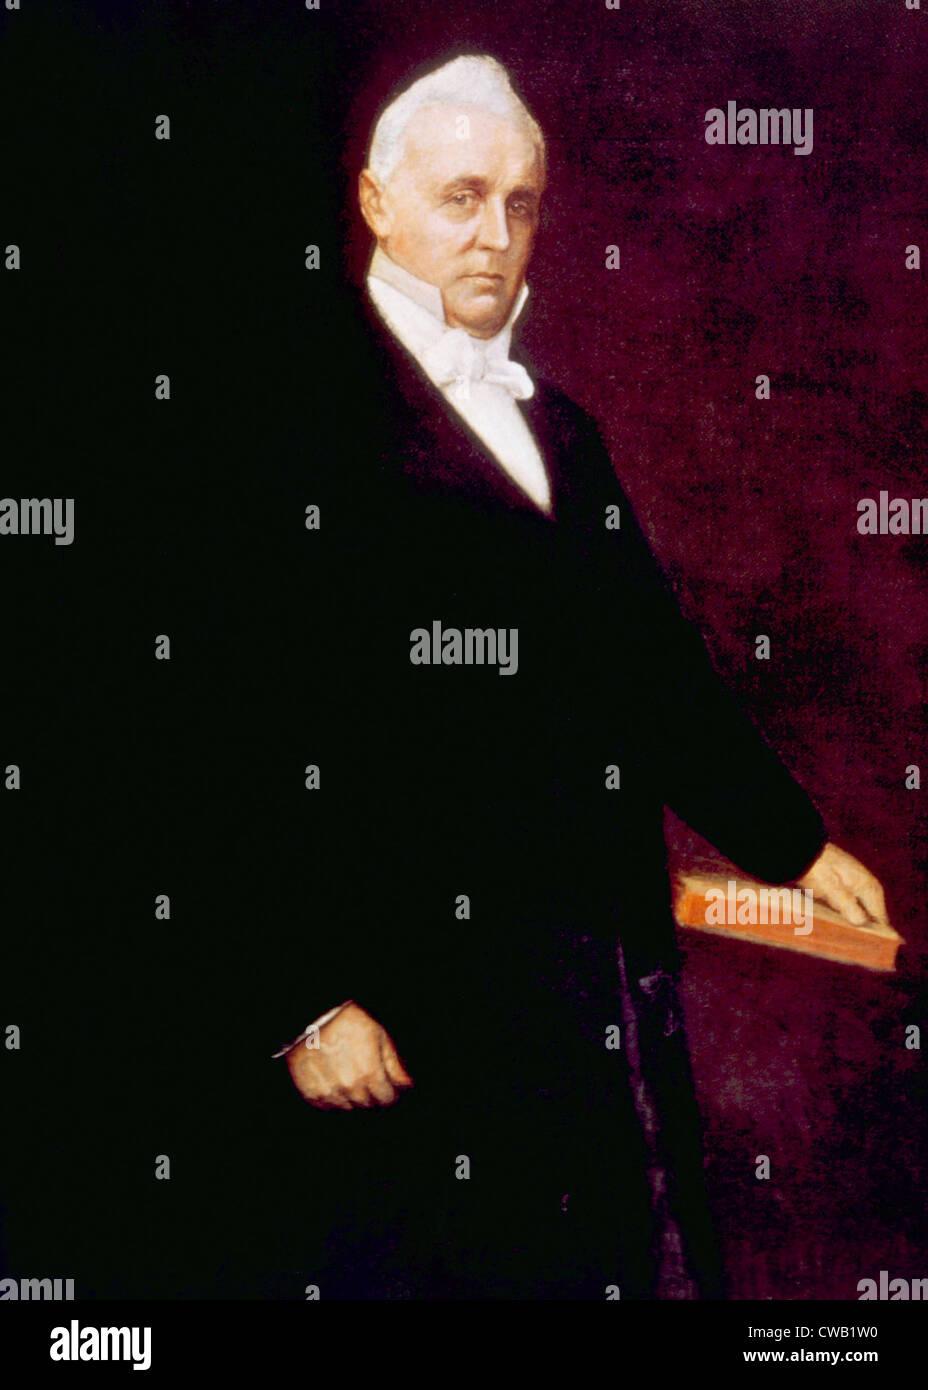 James Buchanan (1791-1868), American President (1857-1861) - Stock Image